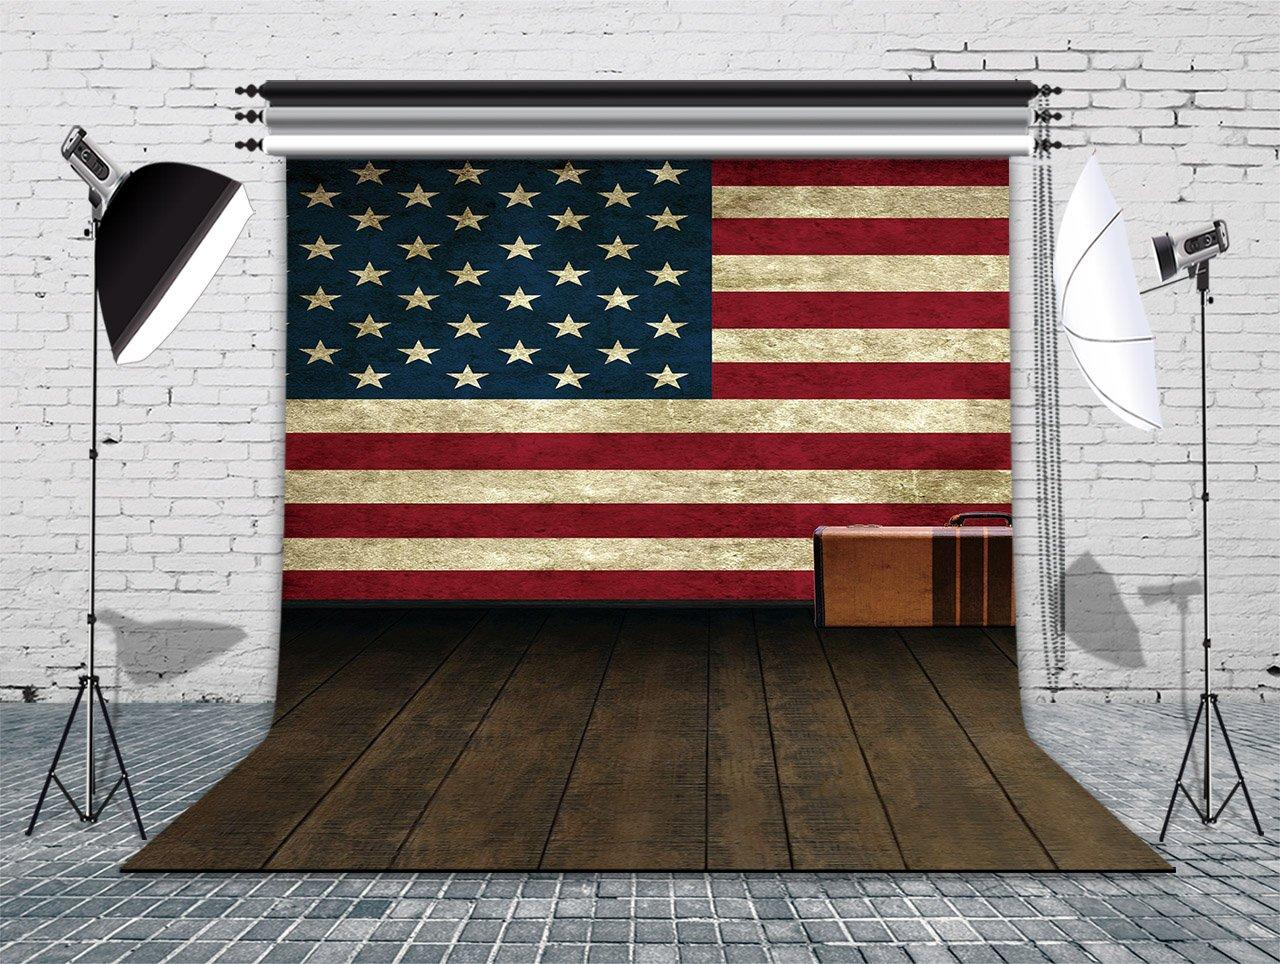 LB 10x10ft National flag Vinyl Photography Backdrop Customized Photo Background Studio Prop 14-153 by backdropday